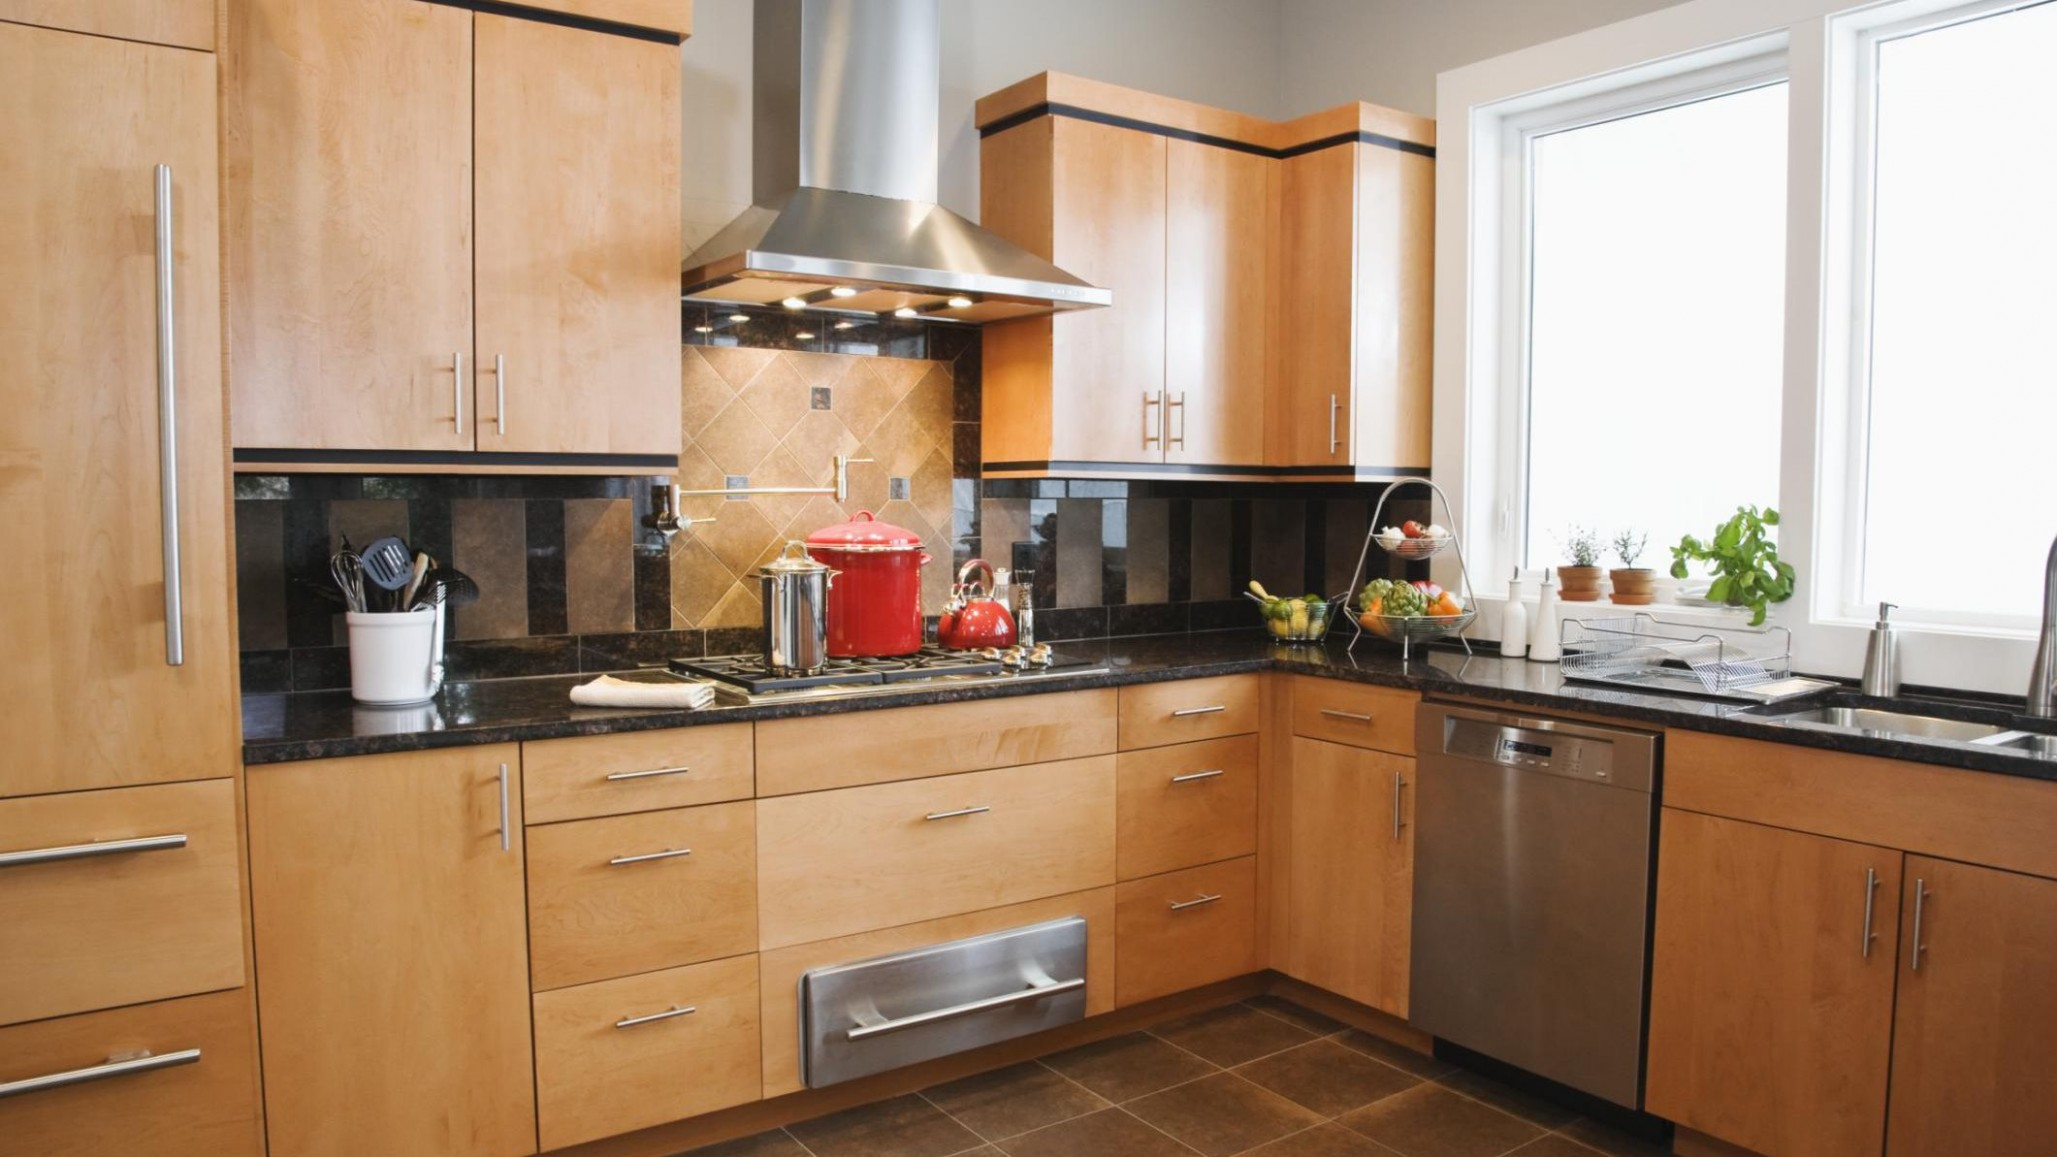 Optimal Kitchen Upper Cabinet Height - Kitchen Cabinets Upper Size